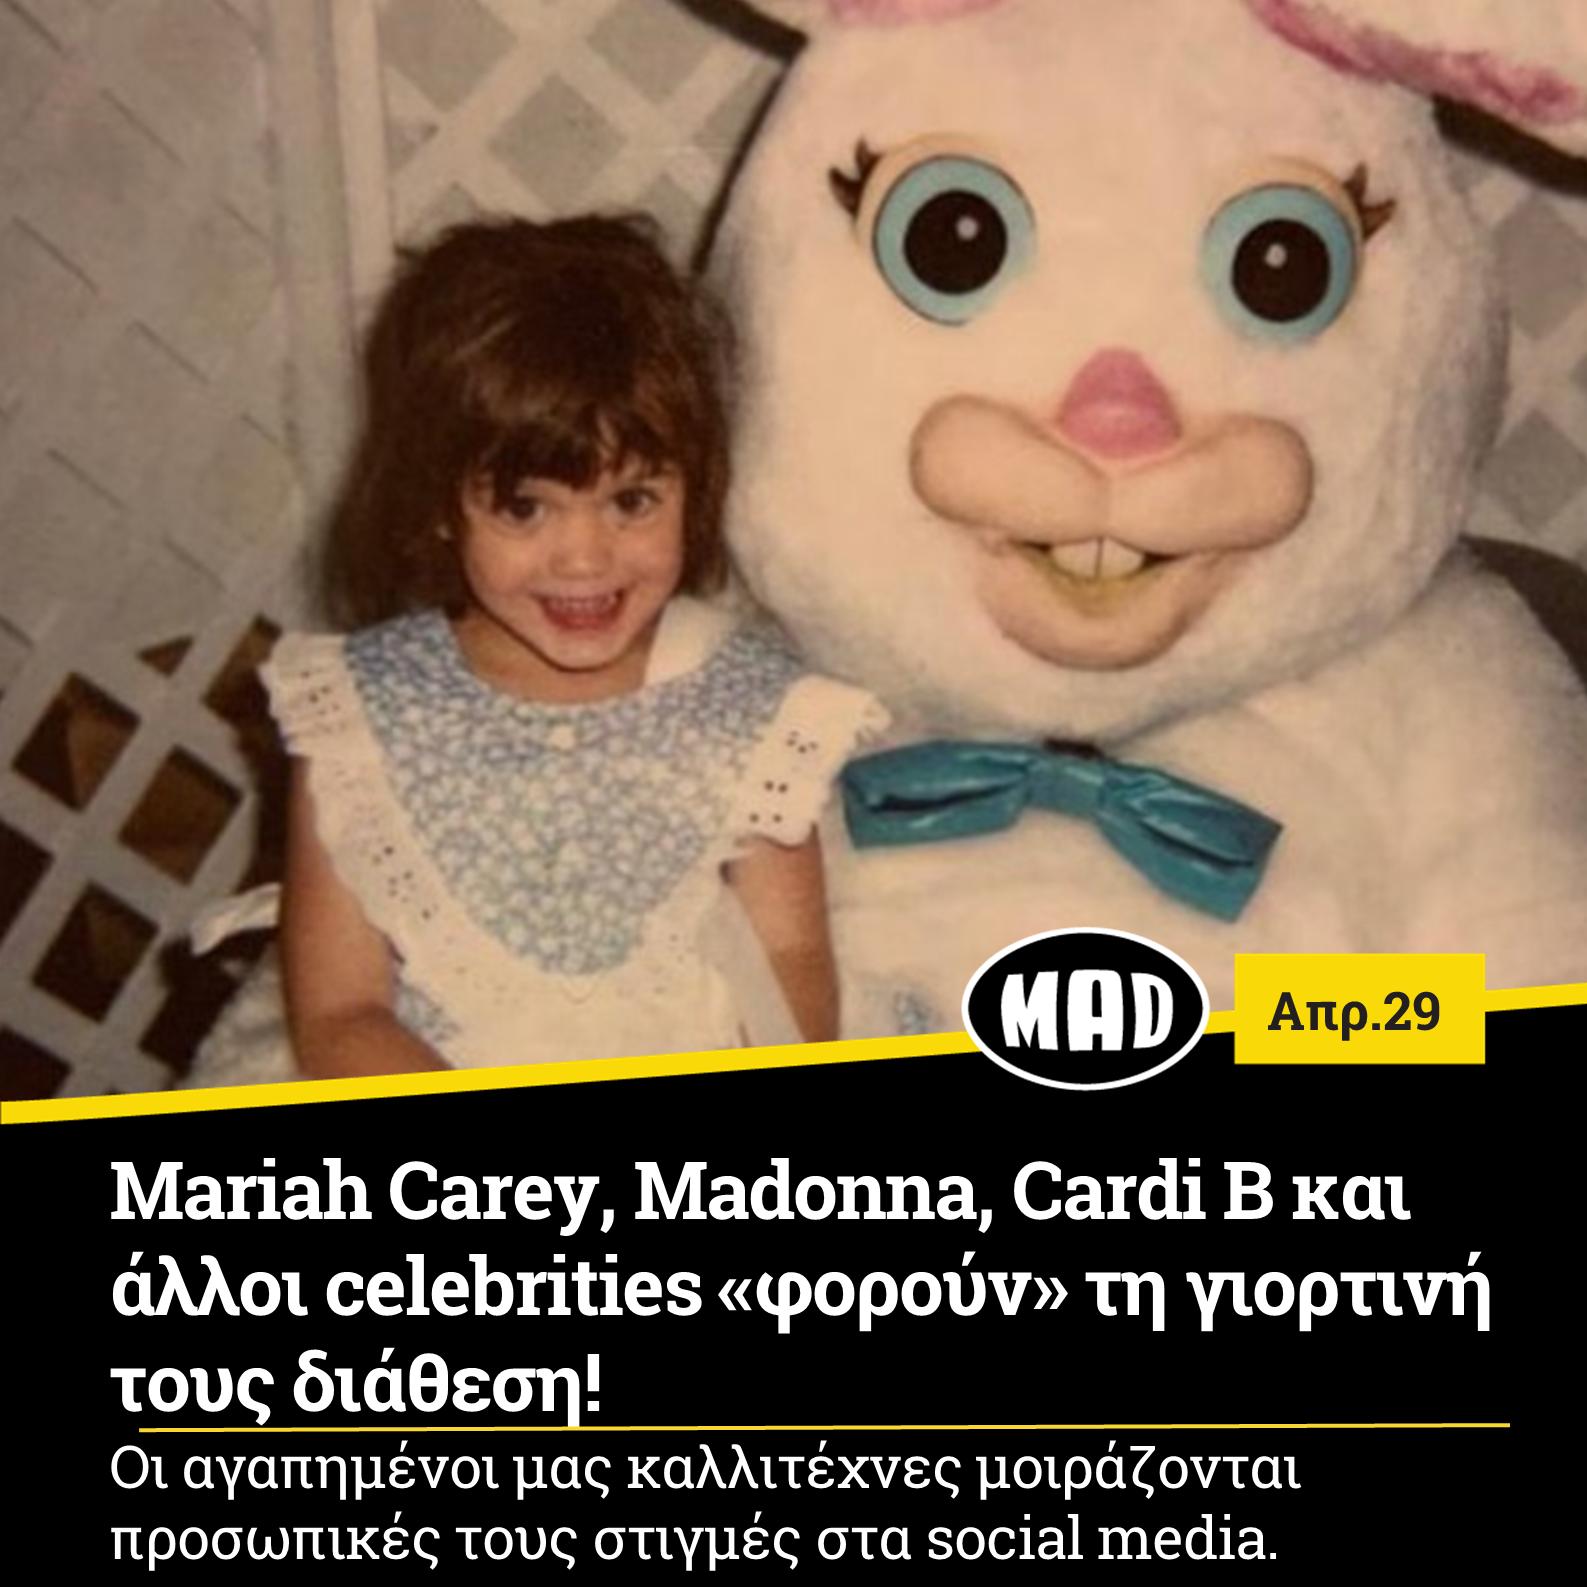 Mariah Carey, Madonna, Cardi B και άλλοι celebrities «φορούν» τη γιορτινή τους διάθεση!